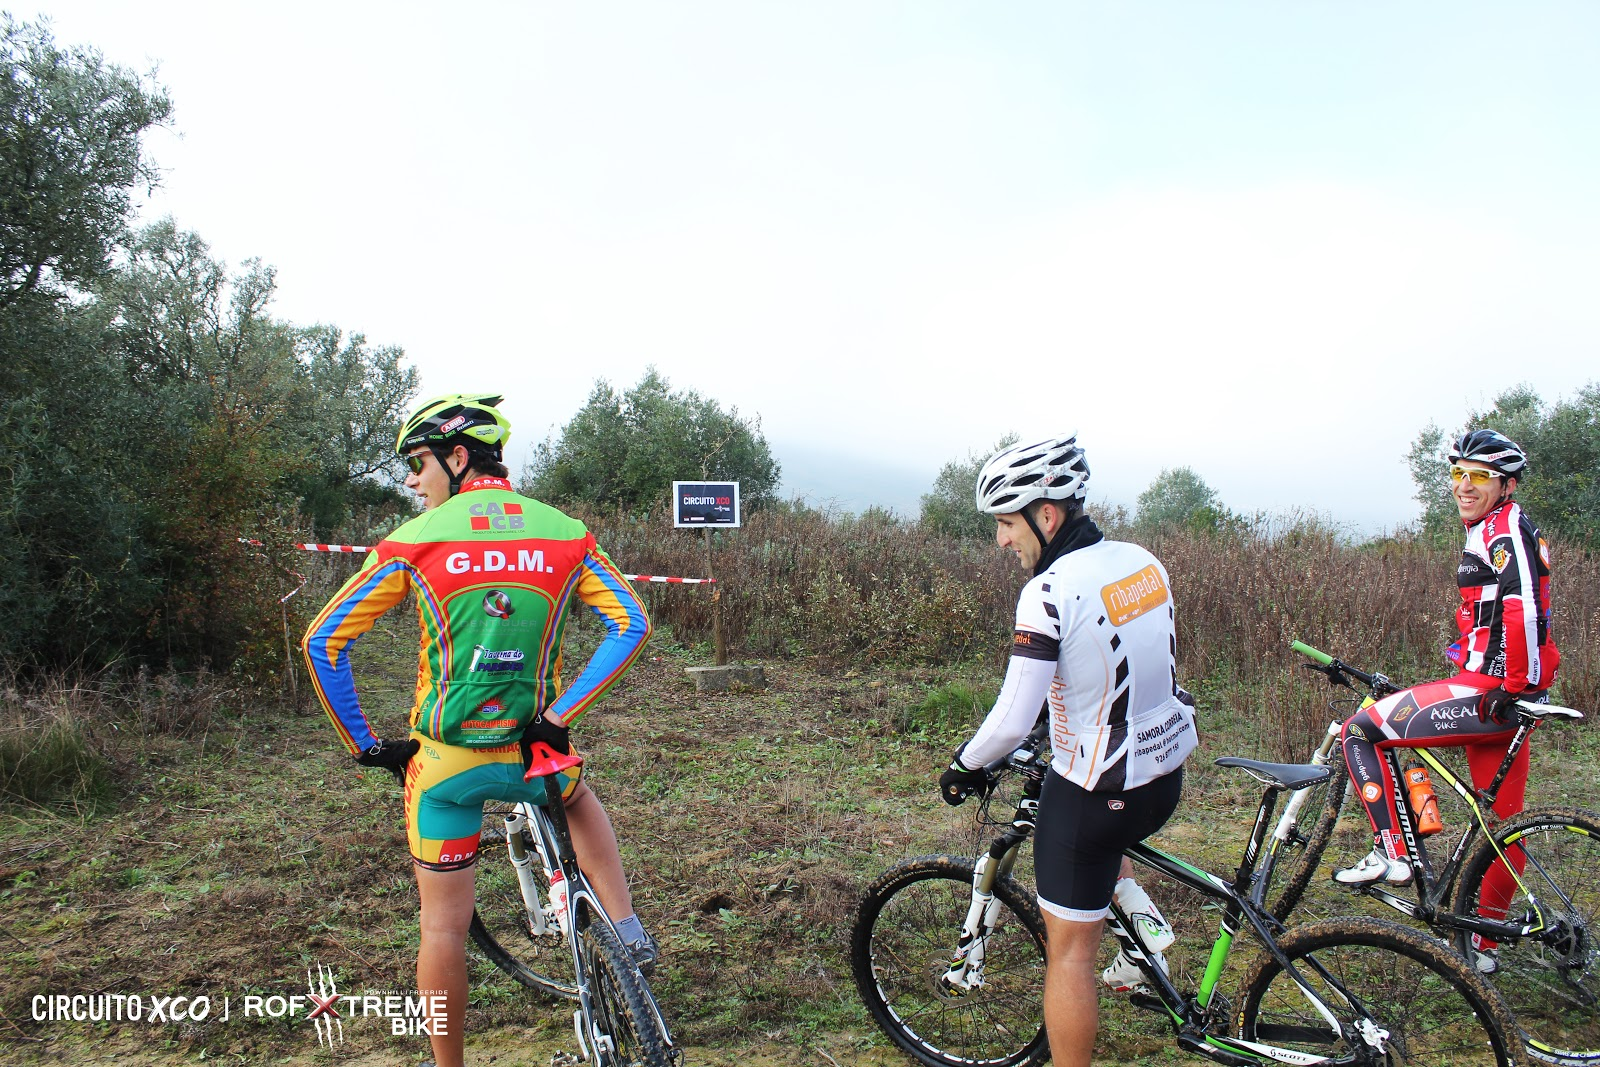 Circuito Xco Moralzarzal : Areal bike rádio alenquer arealbike rádioalenquer